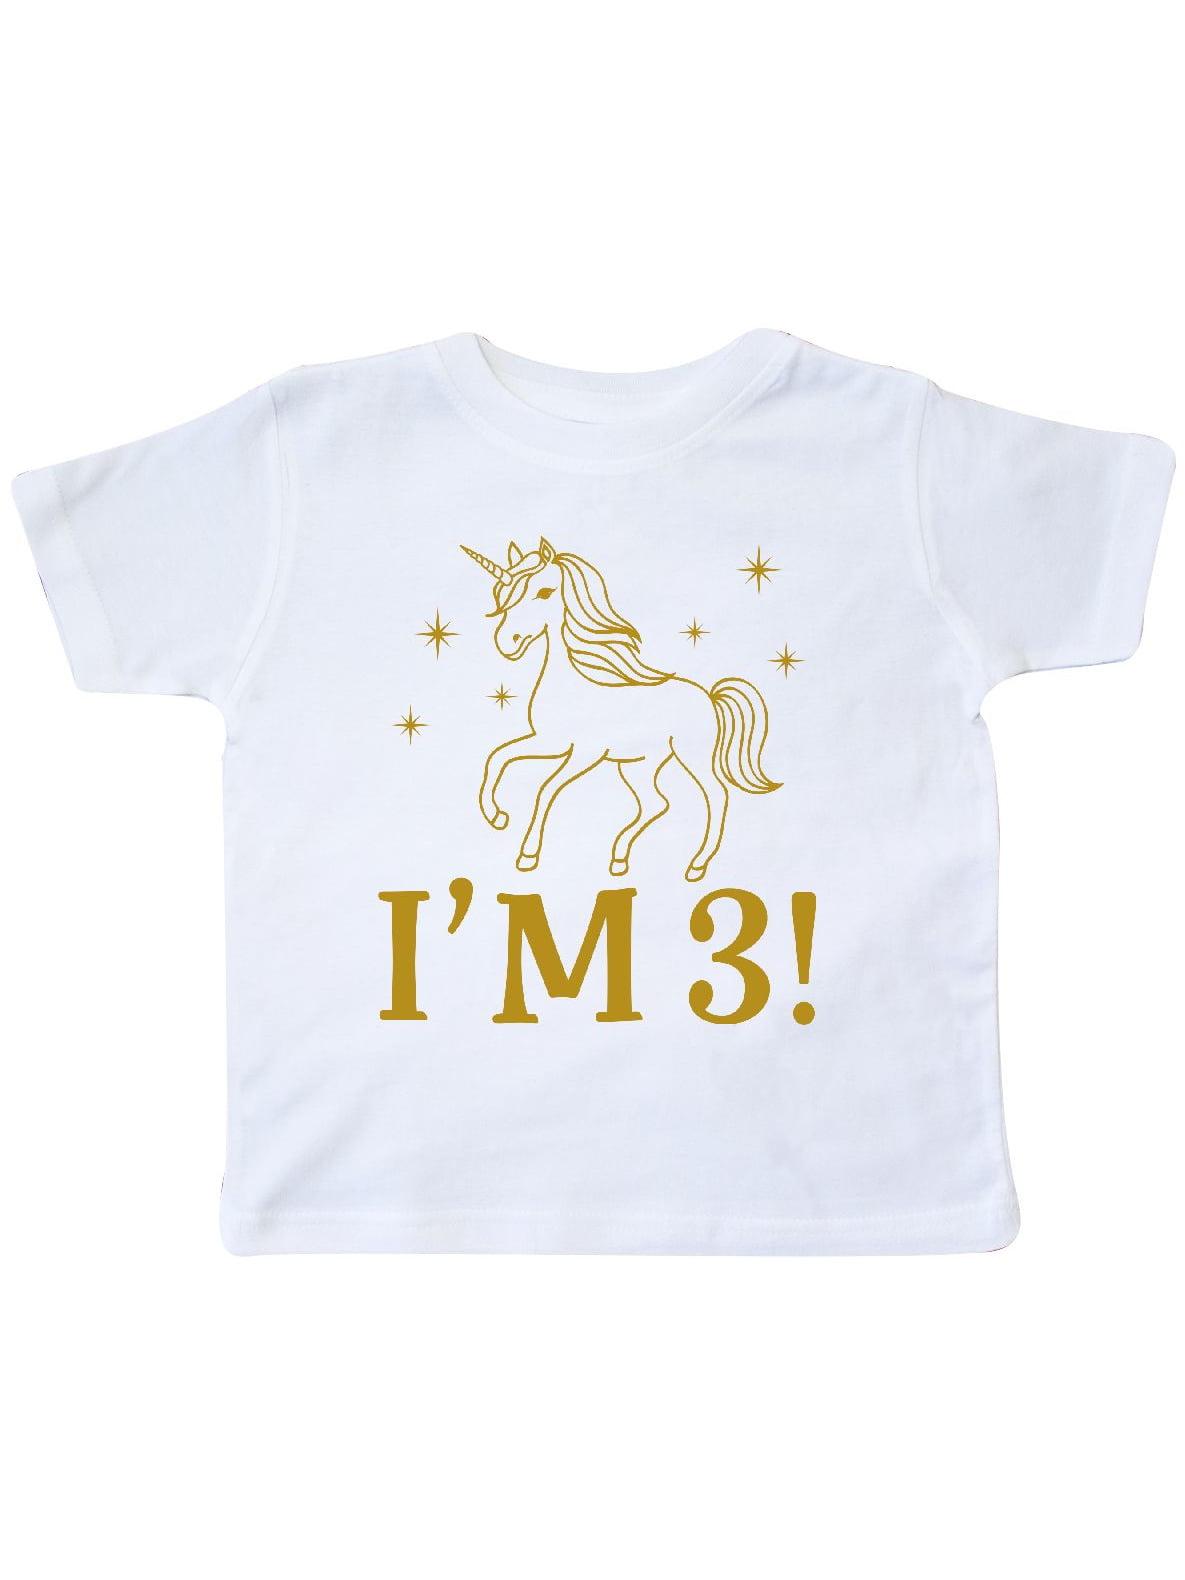 Suit 6-24 Months Black TAOHJS97 Baby Girls Camp Hair Dont Care 1 Short Sleeve Climbing Clothes Pajamas Sleepwear